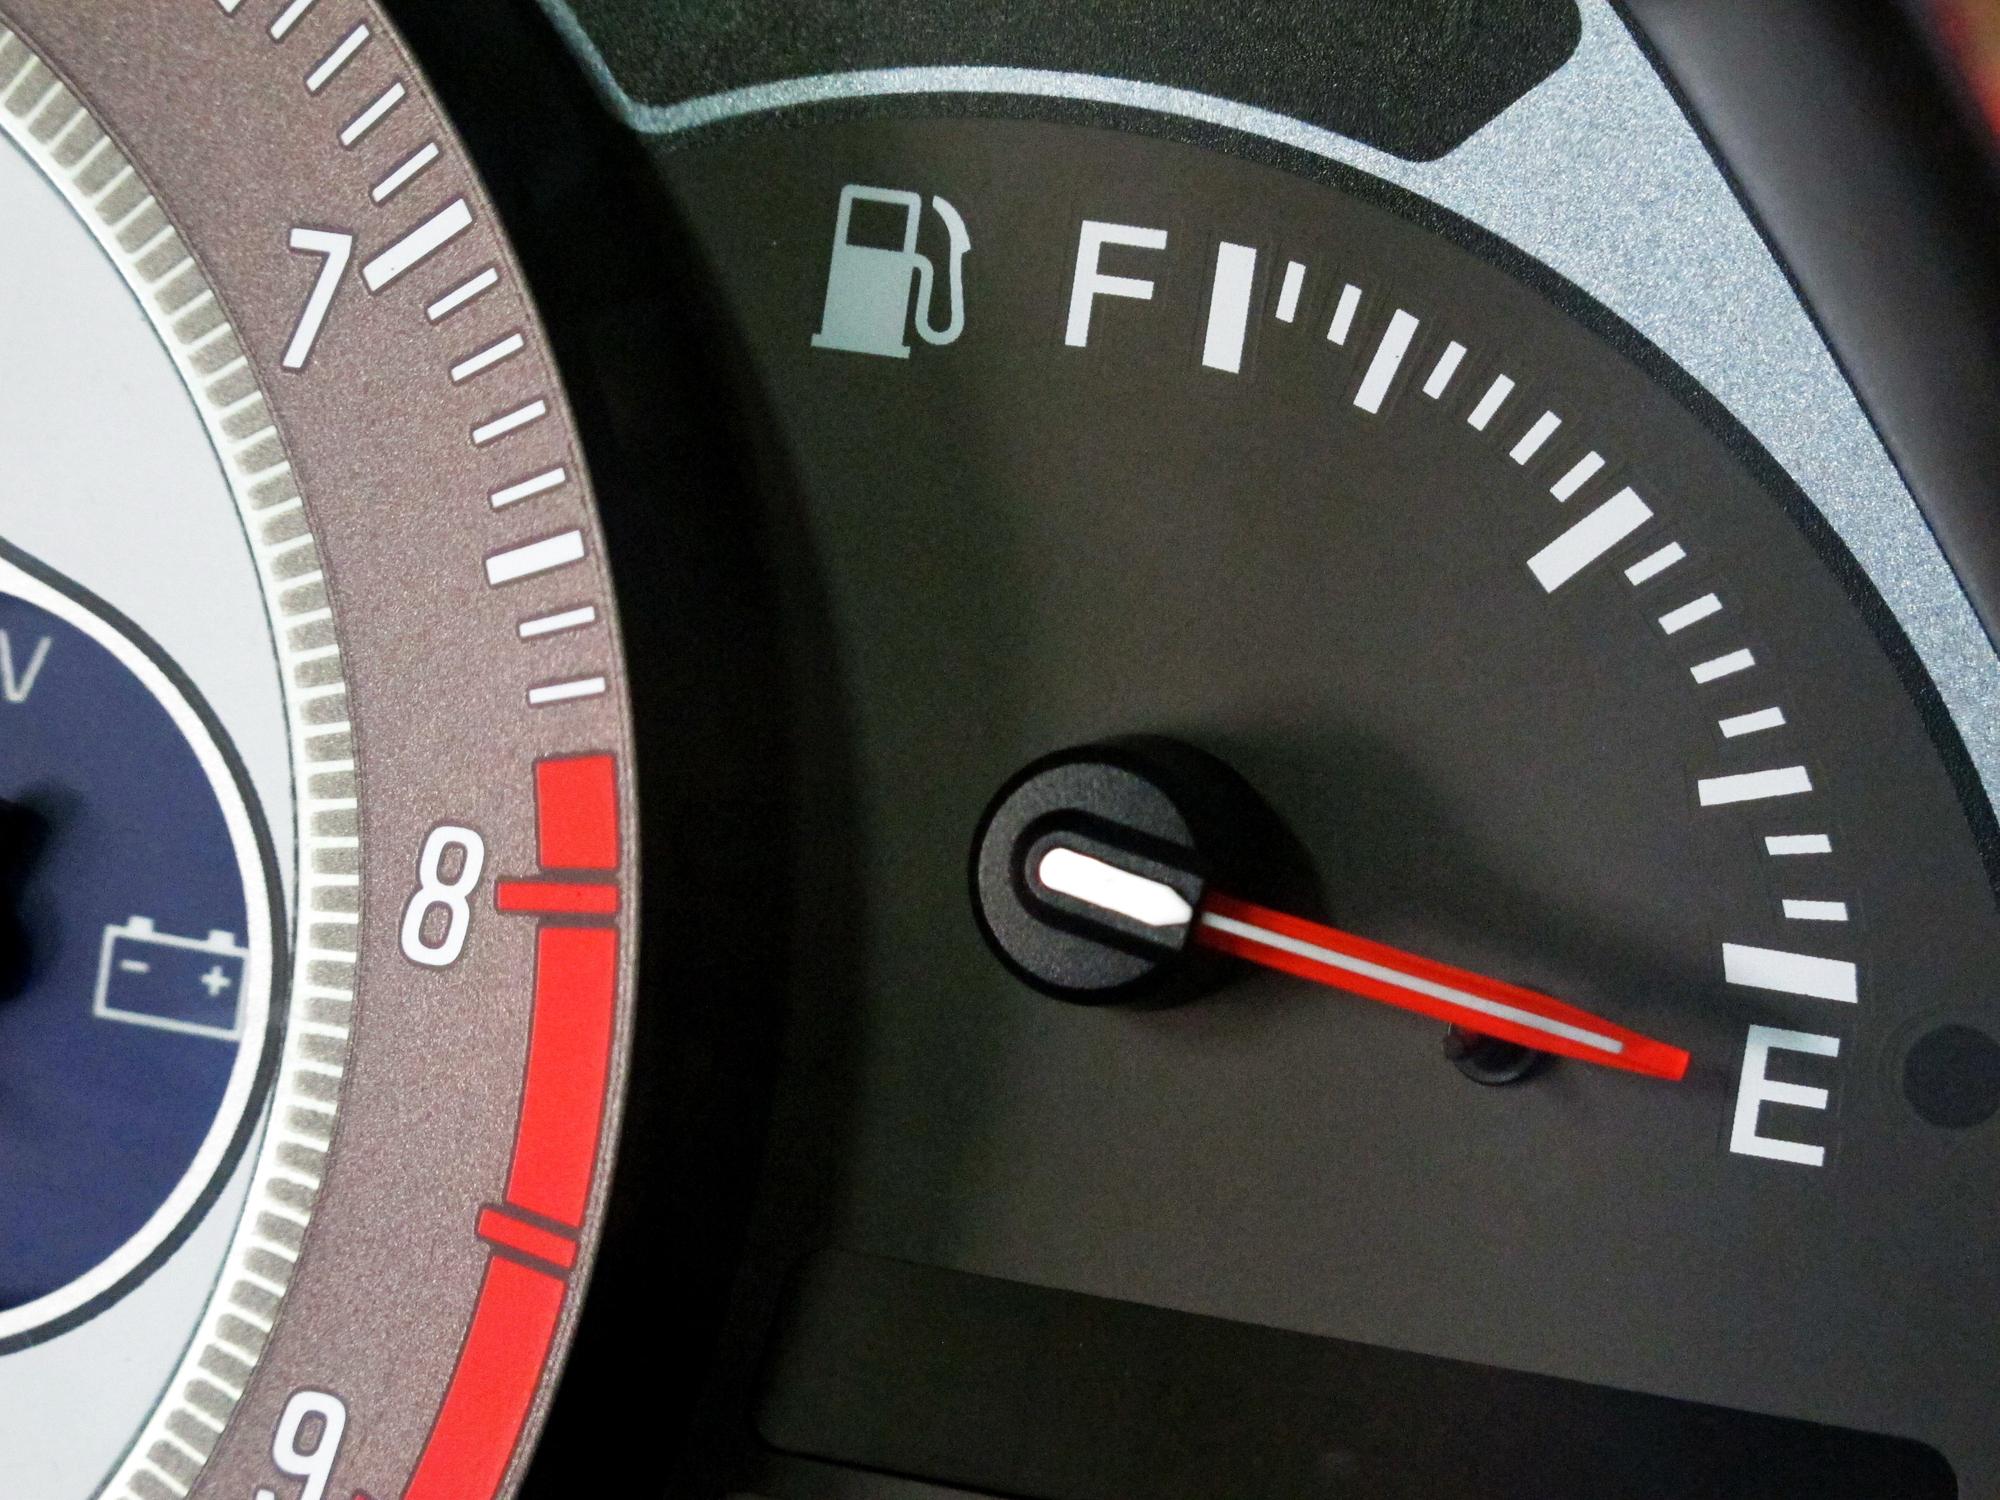 Fuel tank on empty.